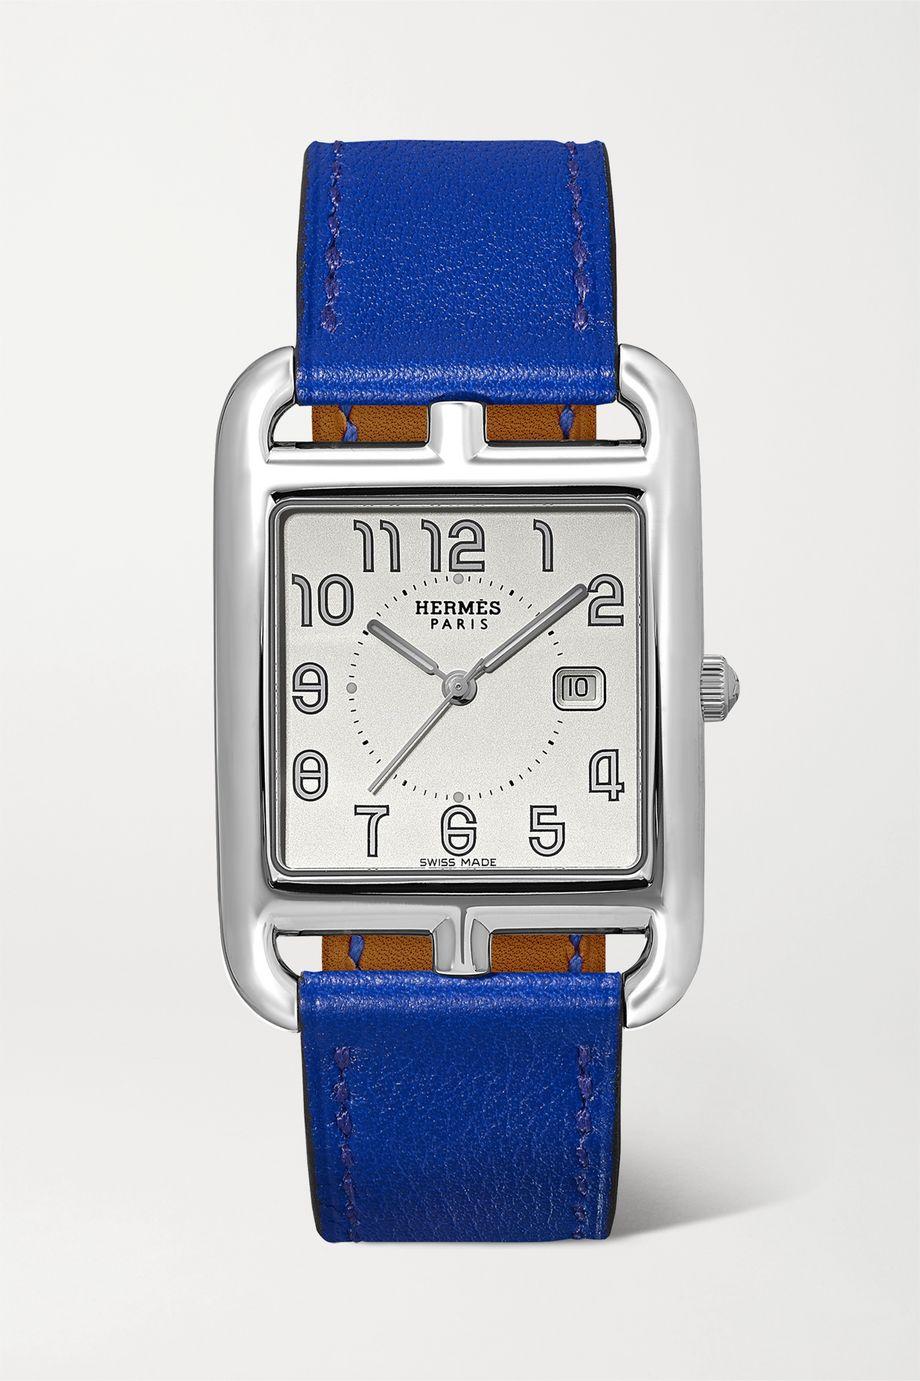 Hermès Timepieces Cape Cod 29 mm mittelgroße Uhr aus Edelstahl mit Lederarmband